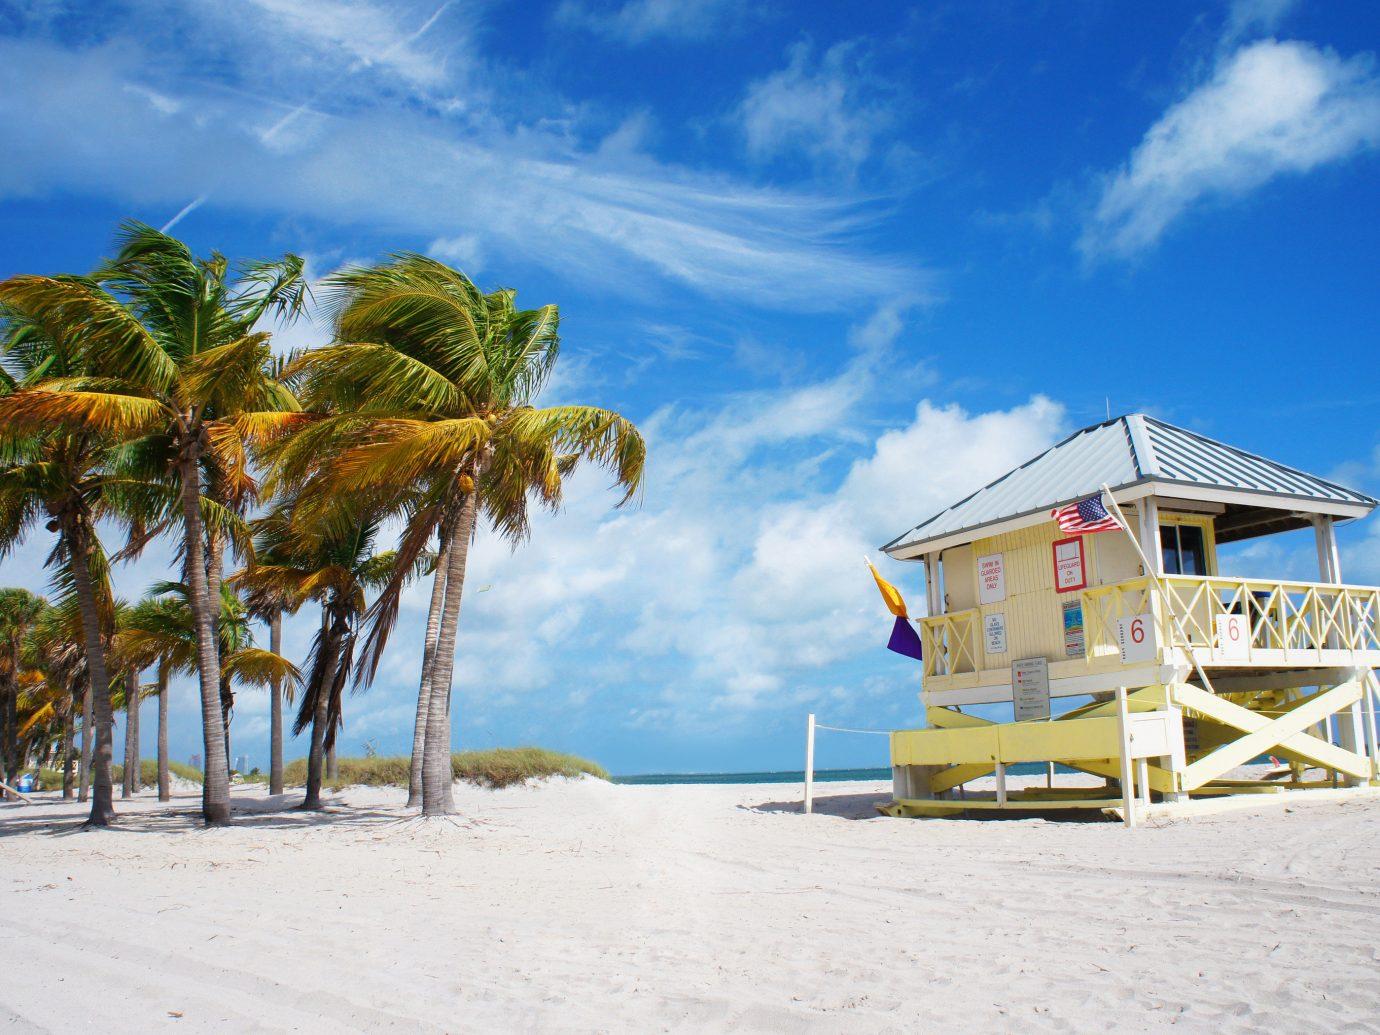 Trip Ideas sky outdoor Beach shore Sea body of water Ocean Coast vacation caribbean Resort Island bay vehicle arecales sandy sand tropics day